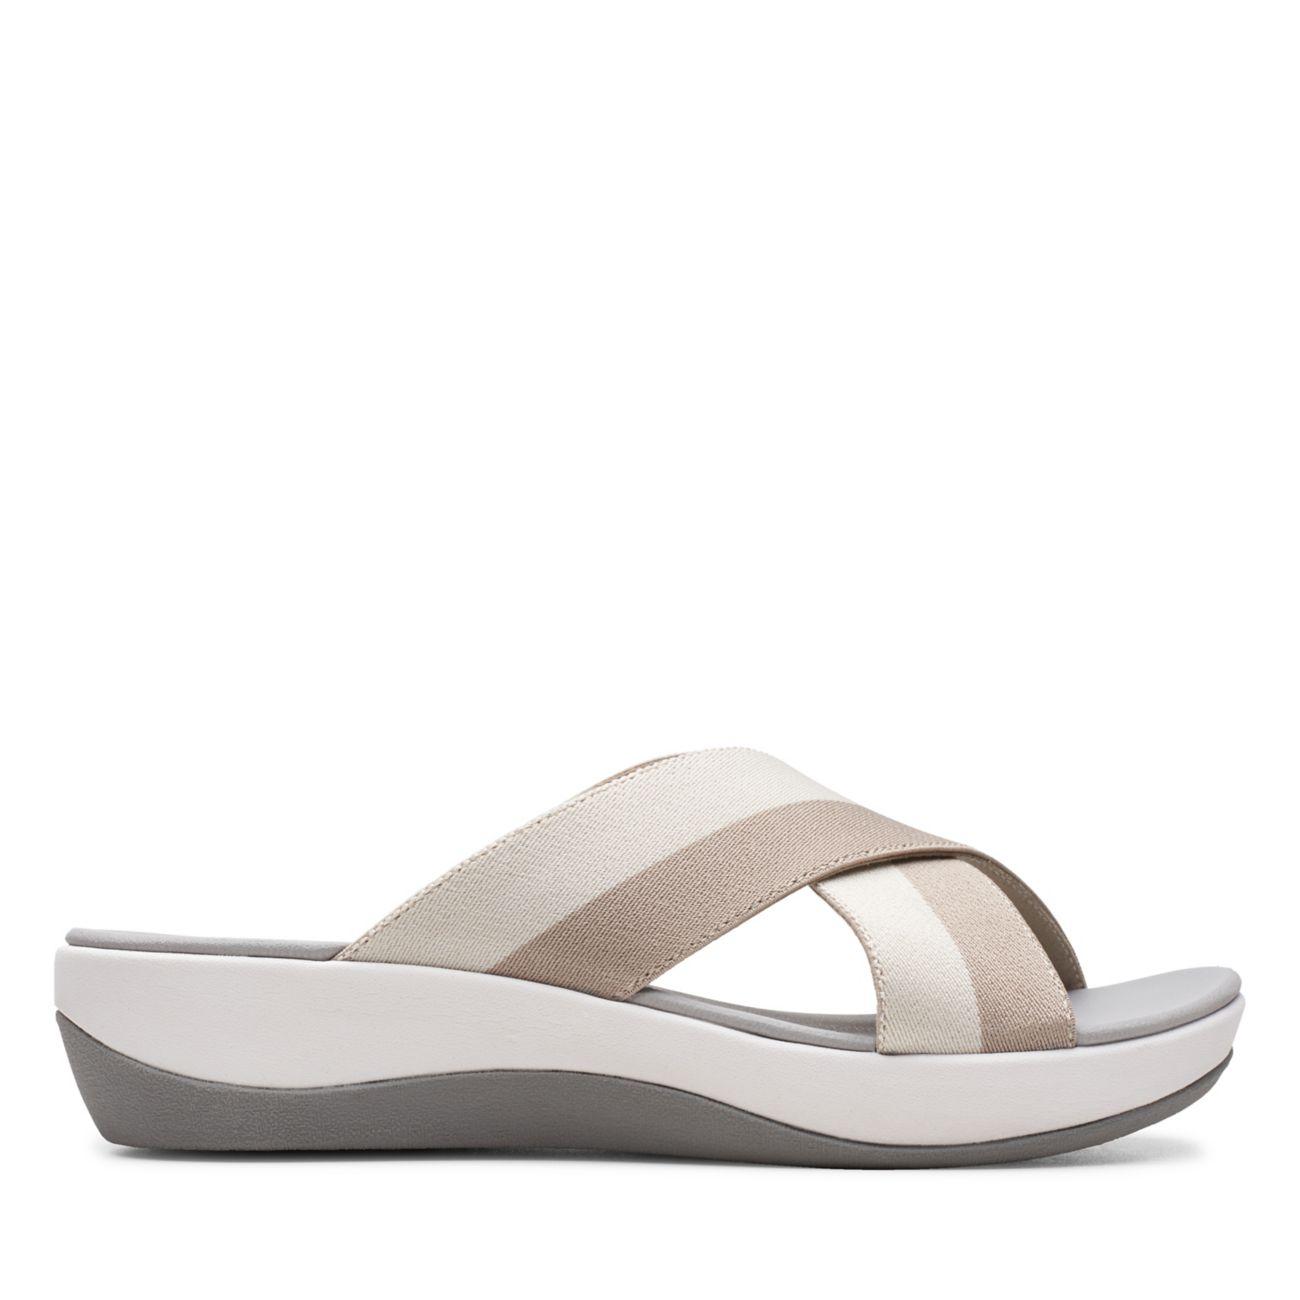 Arla Elin Sand Multi- Womens Sandals - Clarks® Shoes Official Site | Clarks